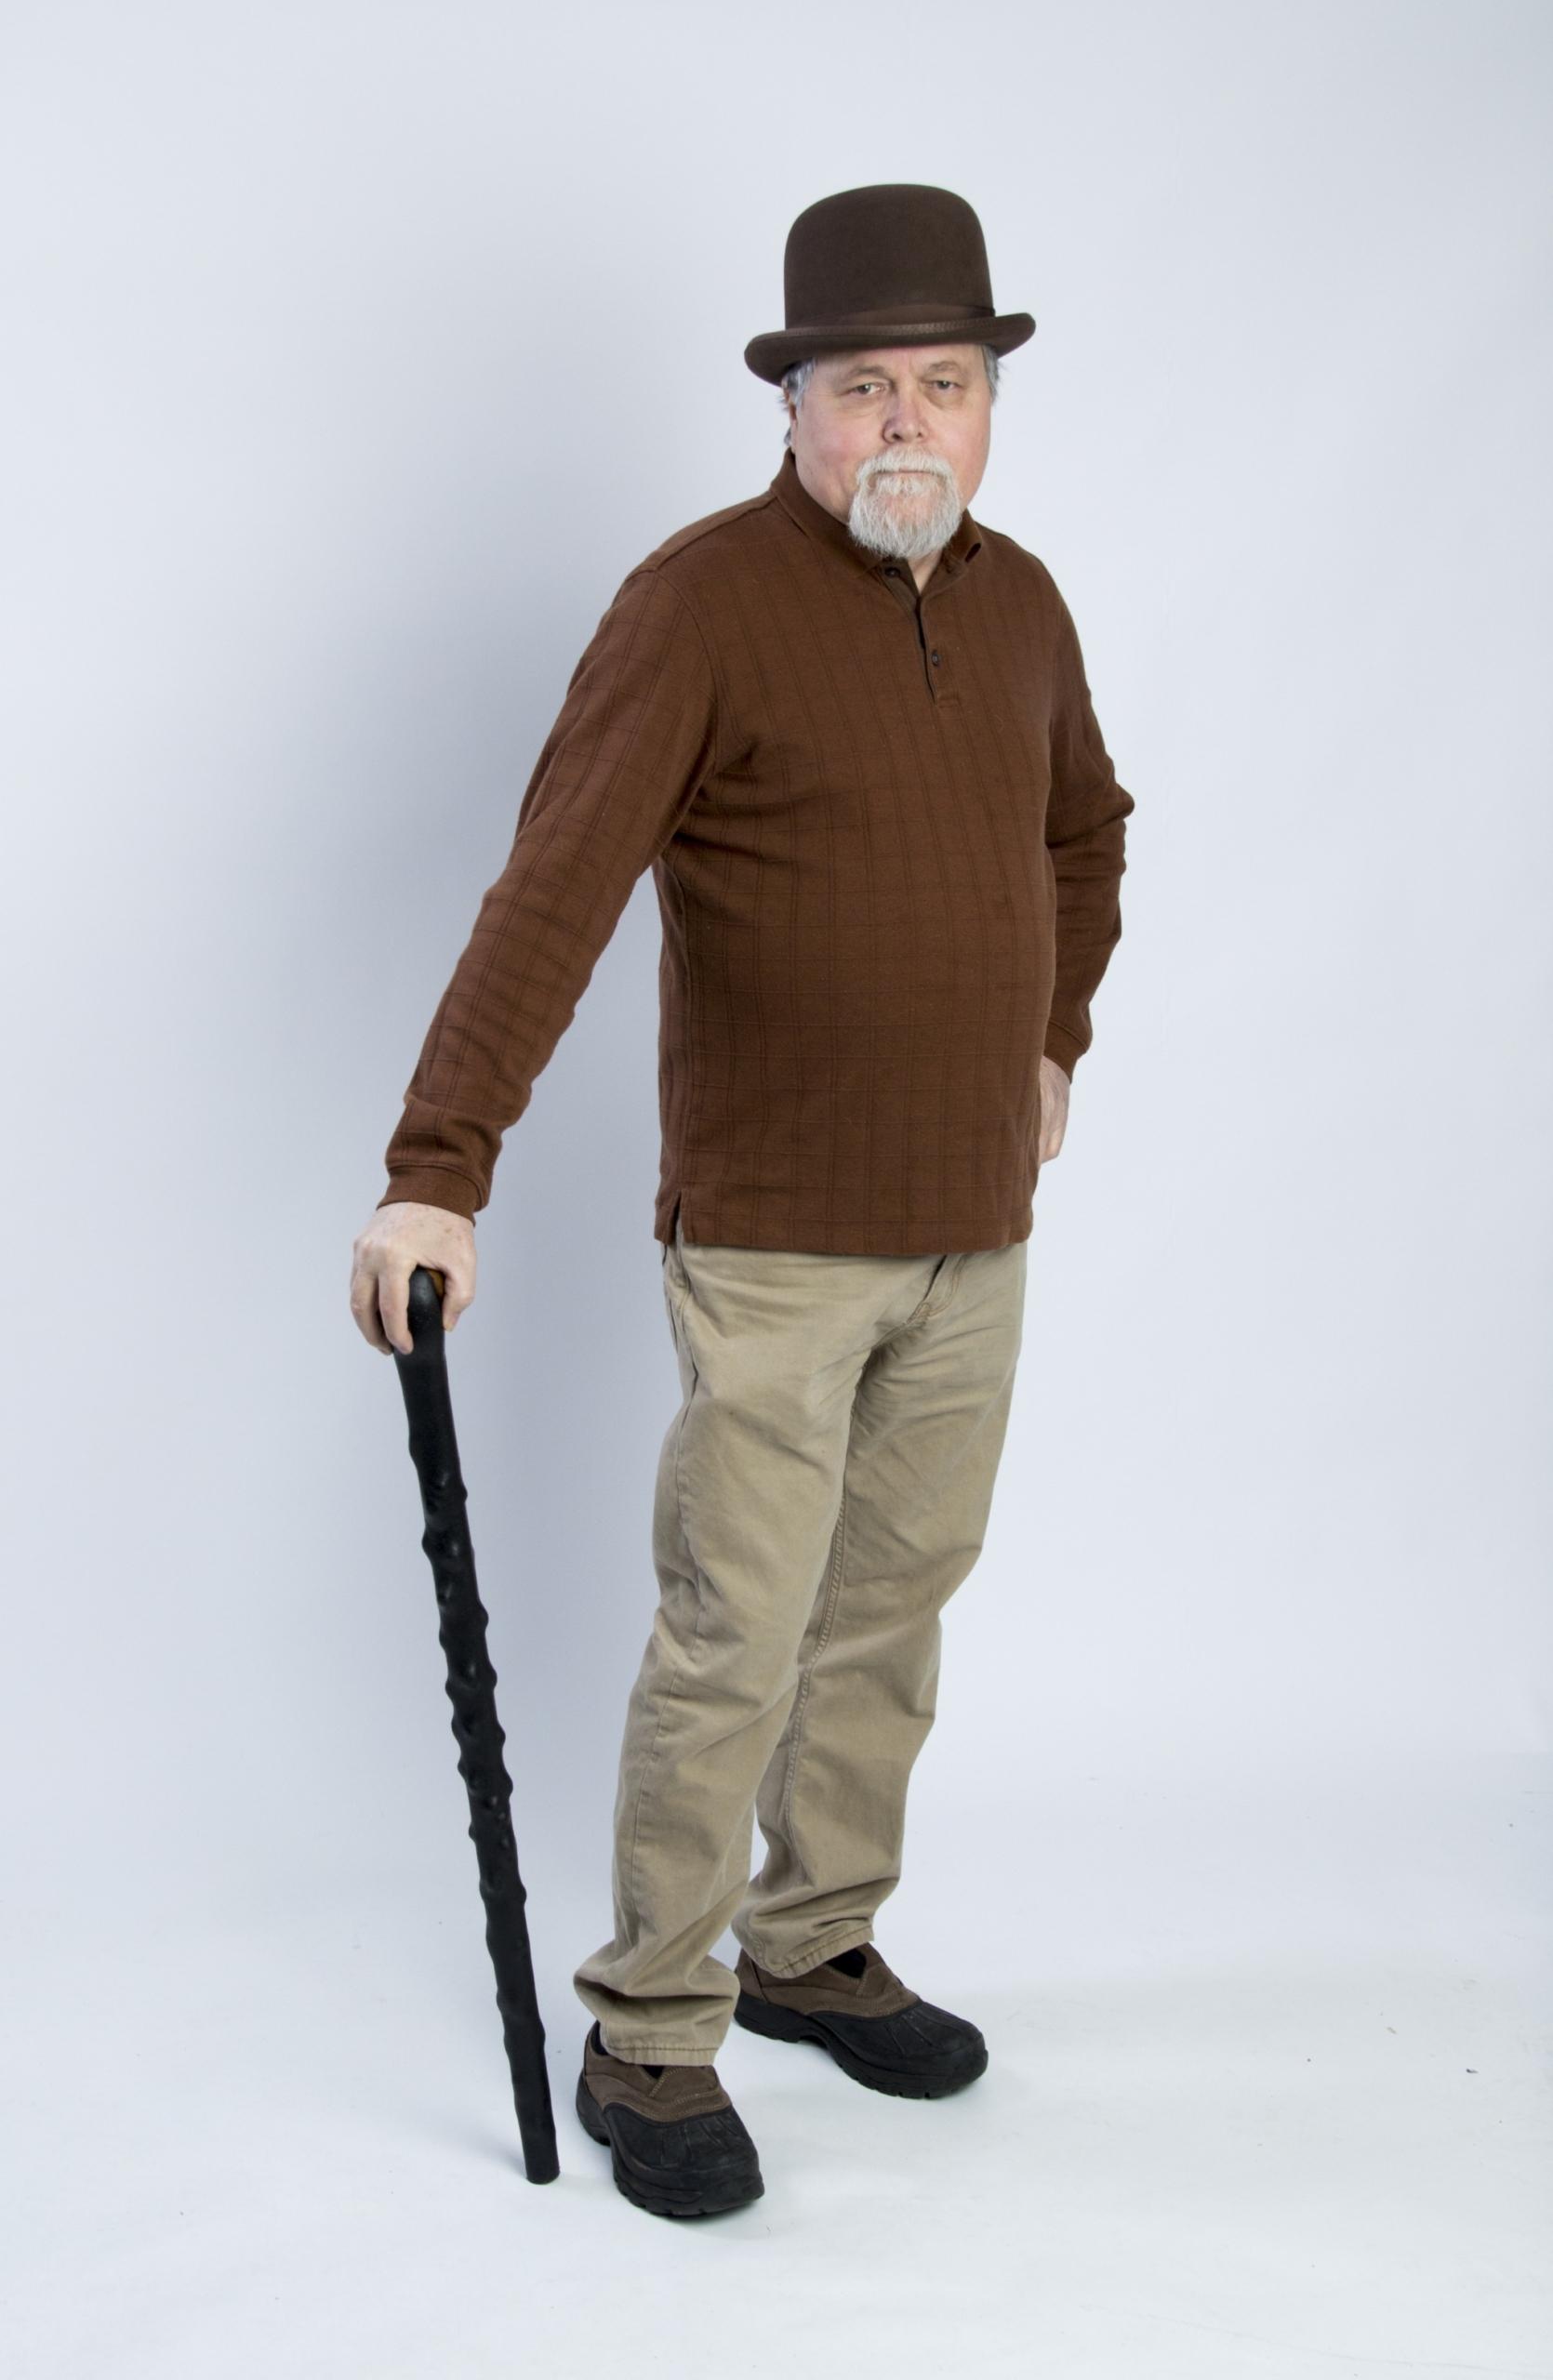 A man using a Shillelagh as a walking stick,a nd not for Irish stick fighting